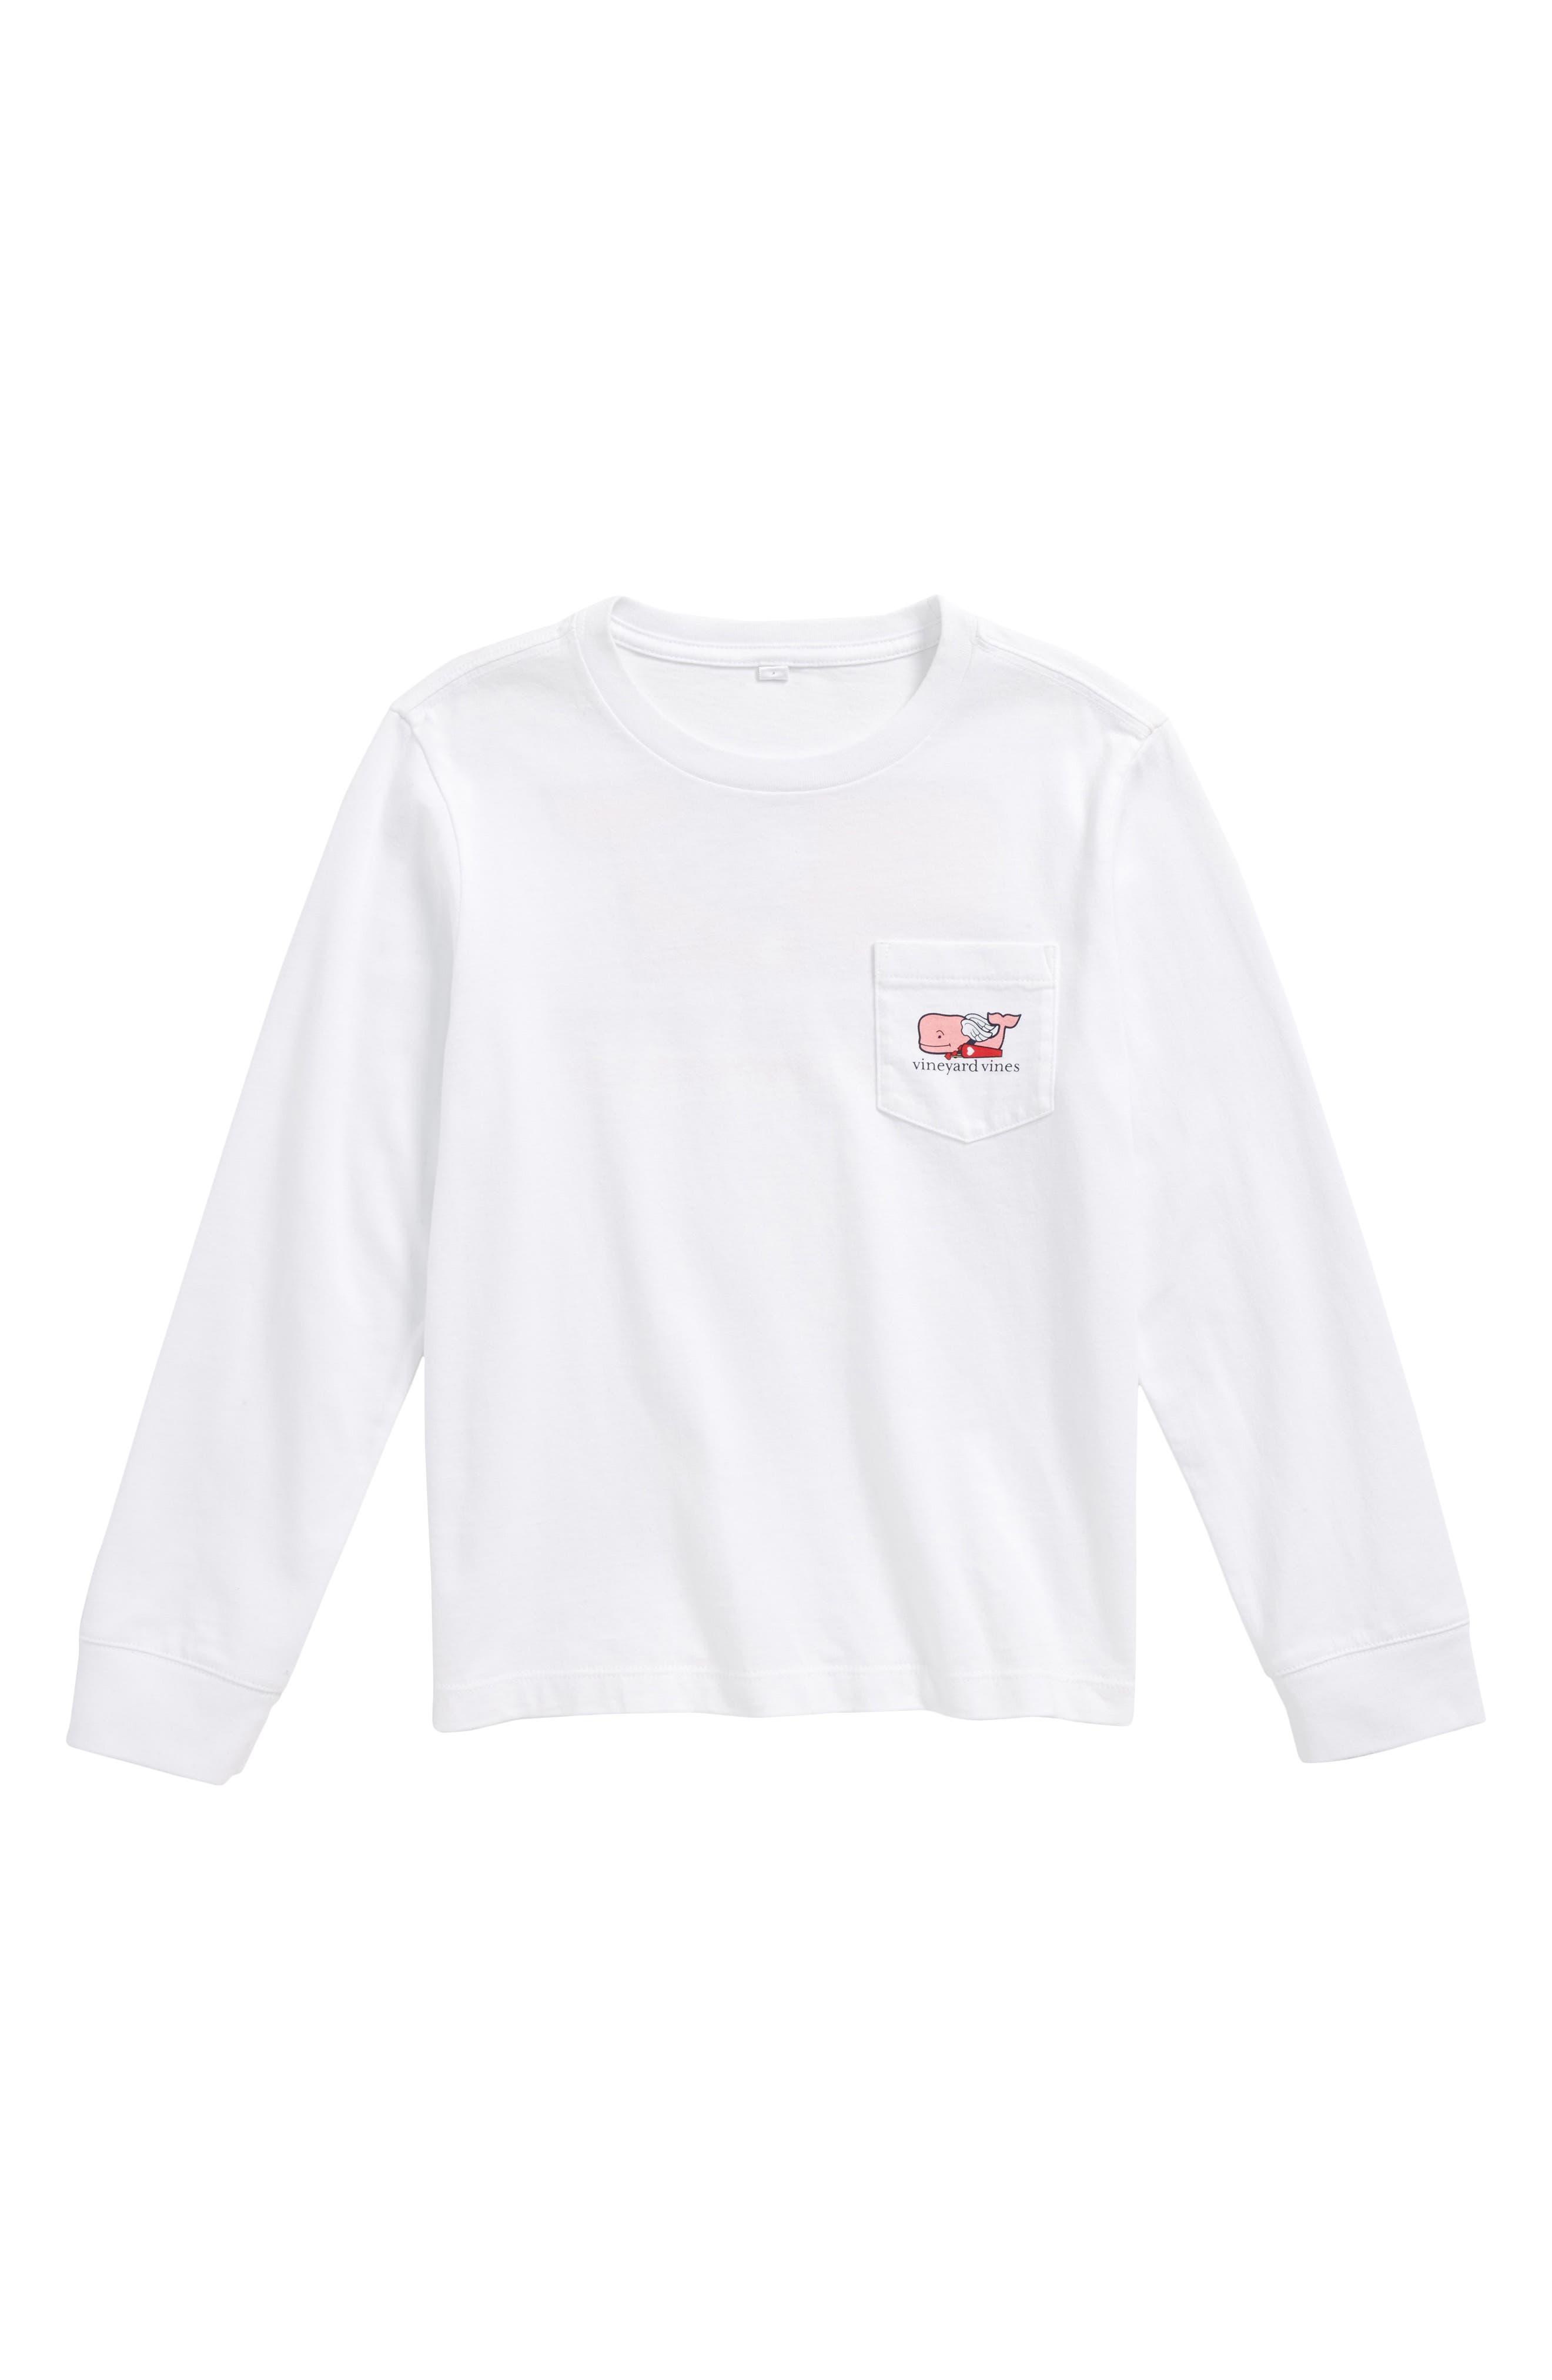 Alternate Image 1 Selected - vineyard vines Cupid Whale Pocket T-Shirt (Big Boys)